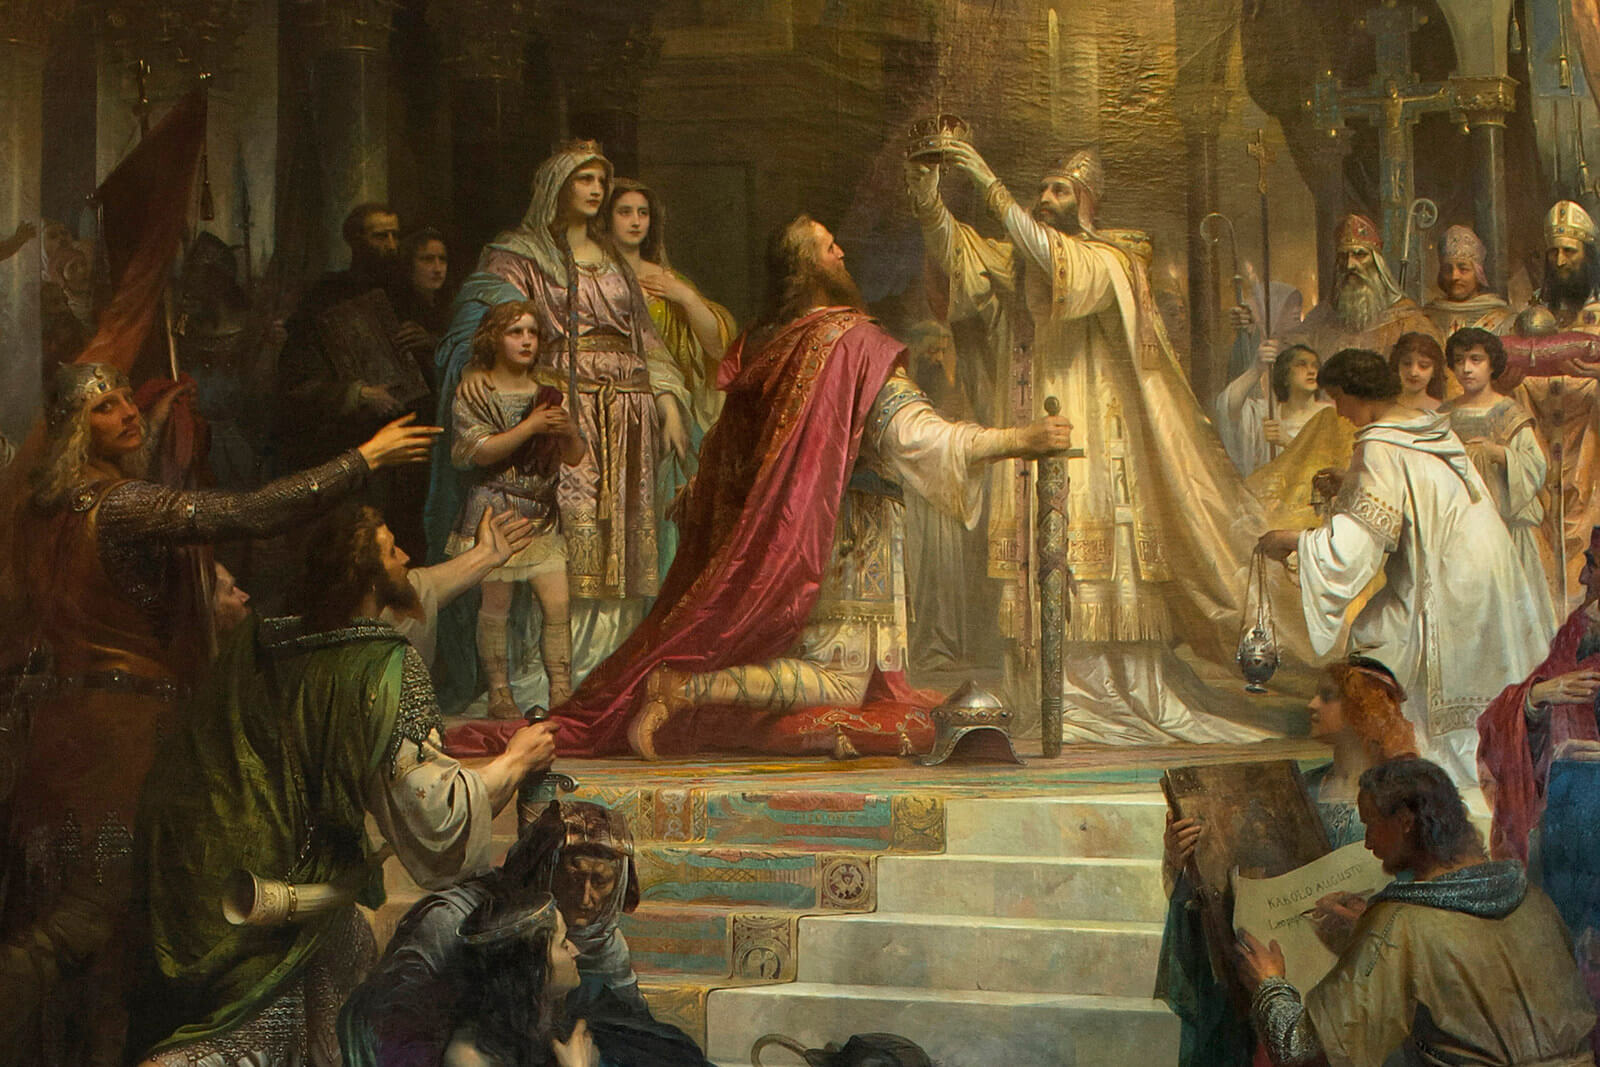 coronation-of-charlenagne-2